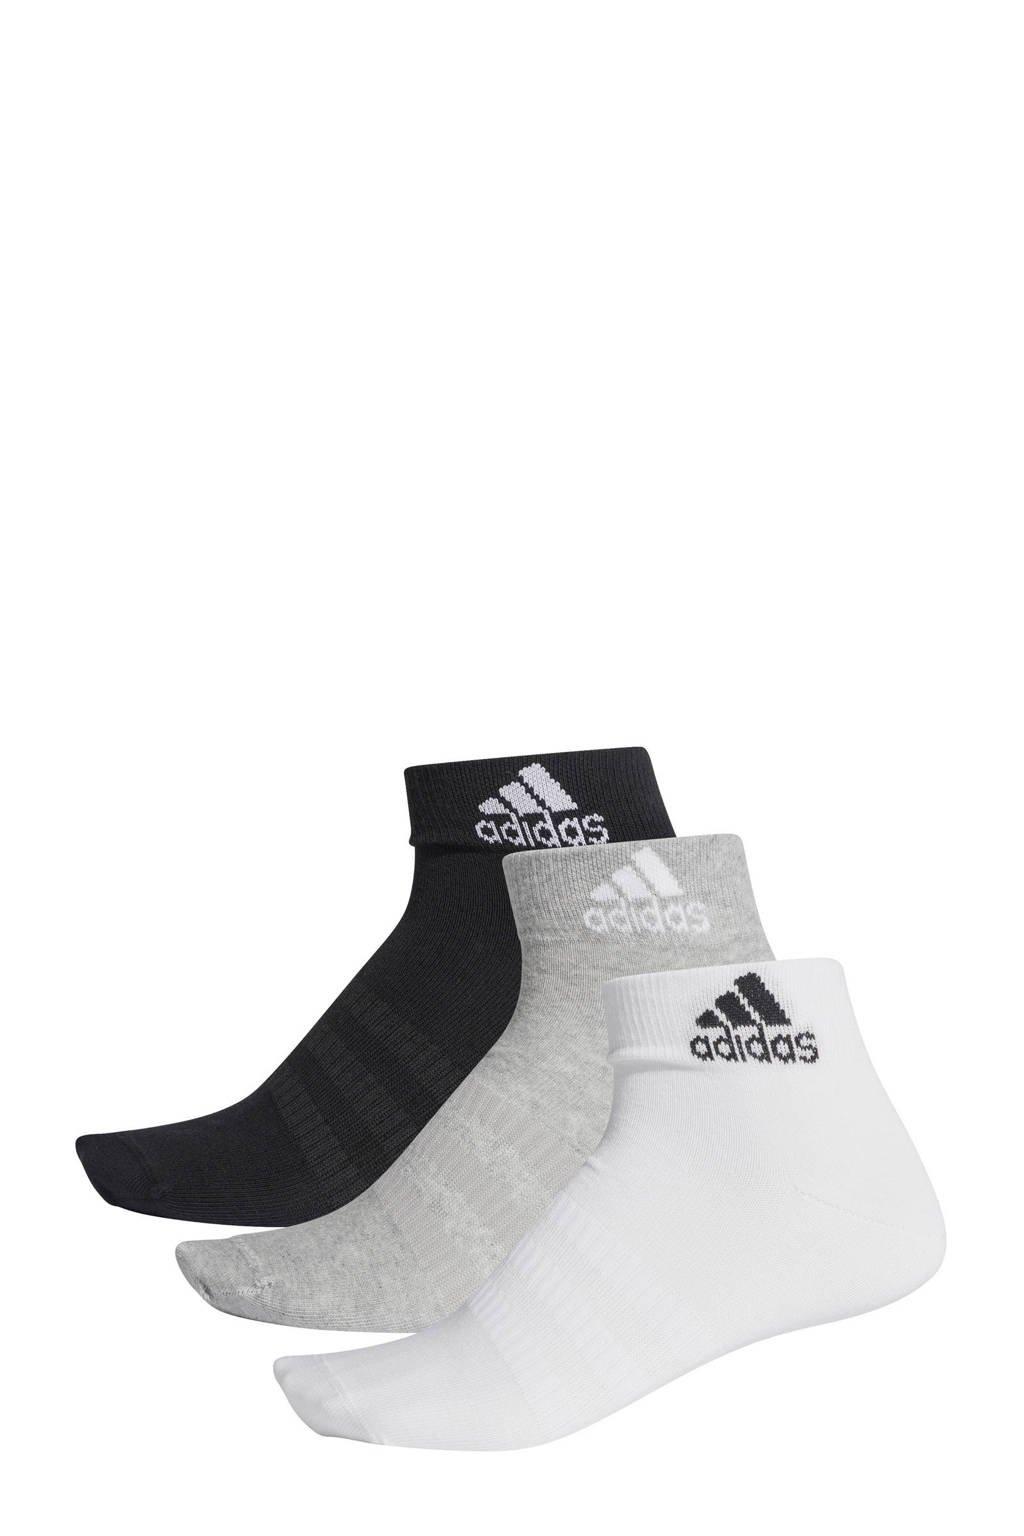 adidas Performance   sportsokken - set van 3 zwart/grijs/wit, Grijs/zwart/wit